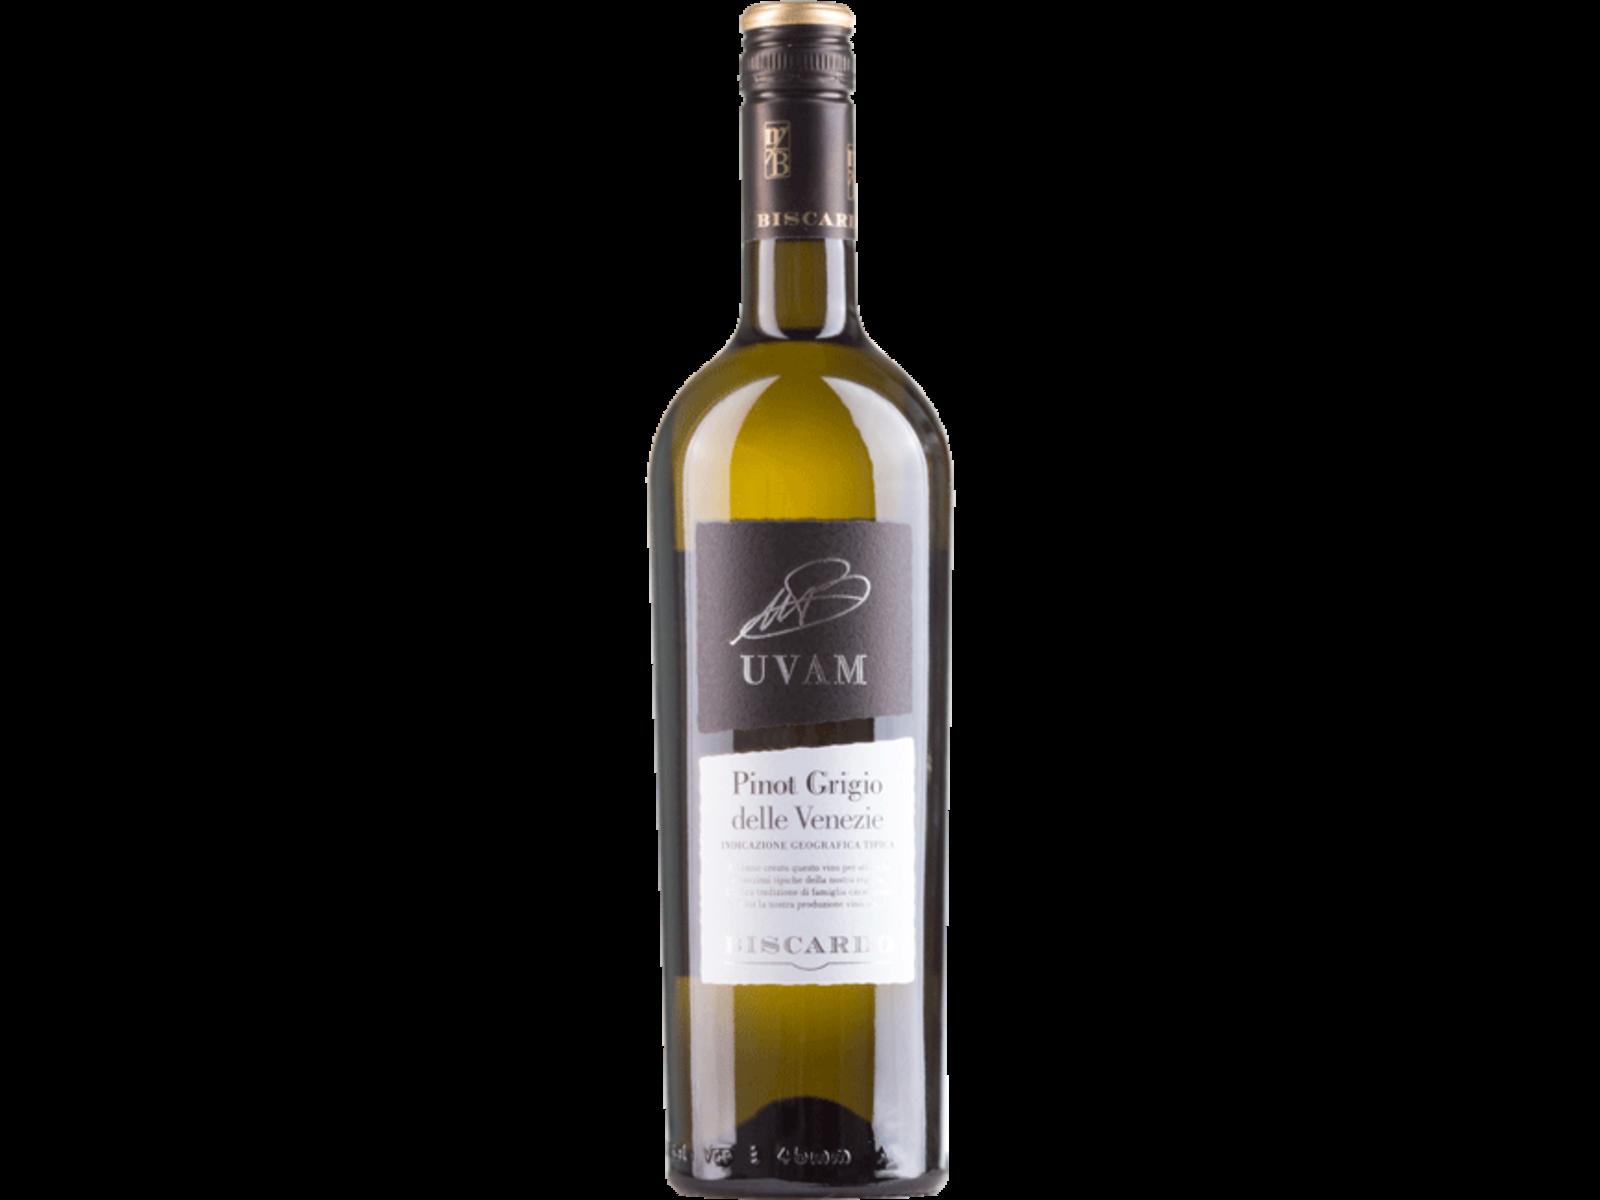 Biscardo Vini Biscardo UVAM Pinot Grigio delle Venezie